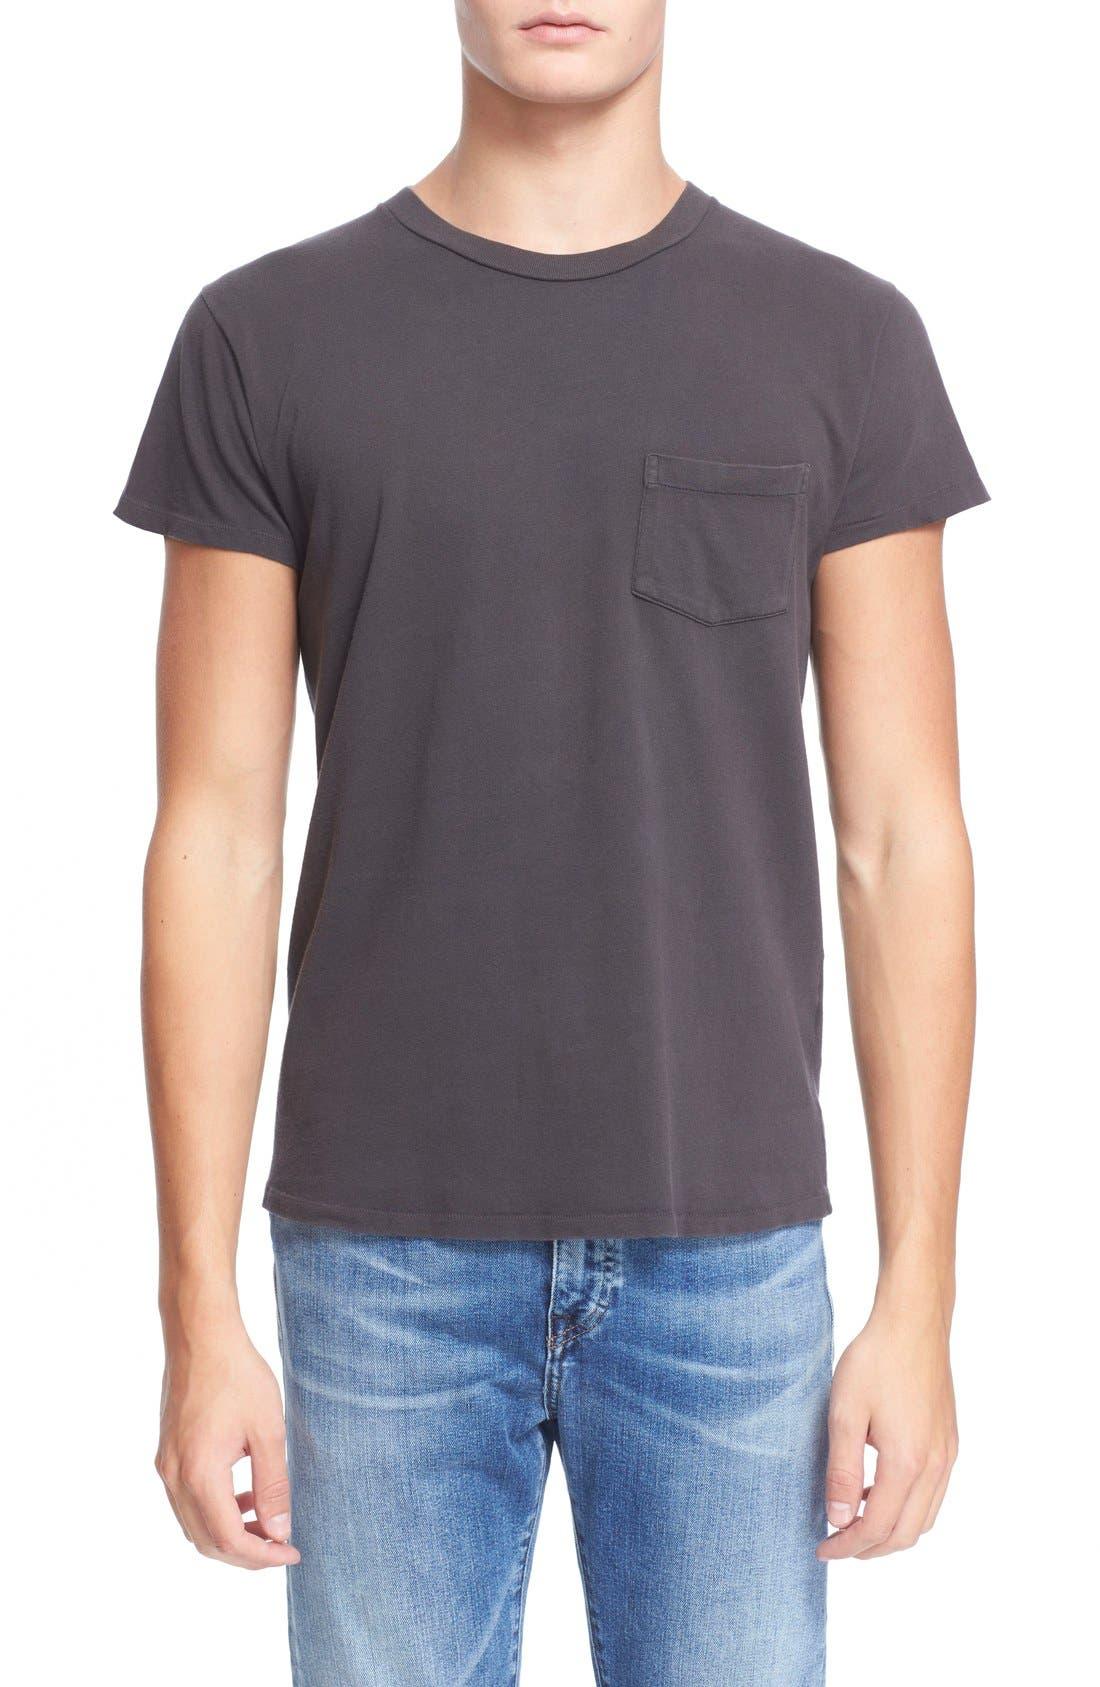 Levi's Vintage Clothing '1950s' Pocket T-Shirt,                             Main thumbnail 1, color,                             001